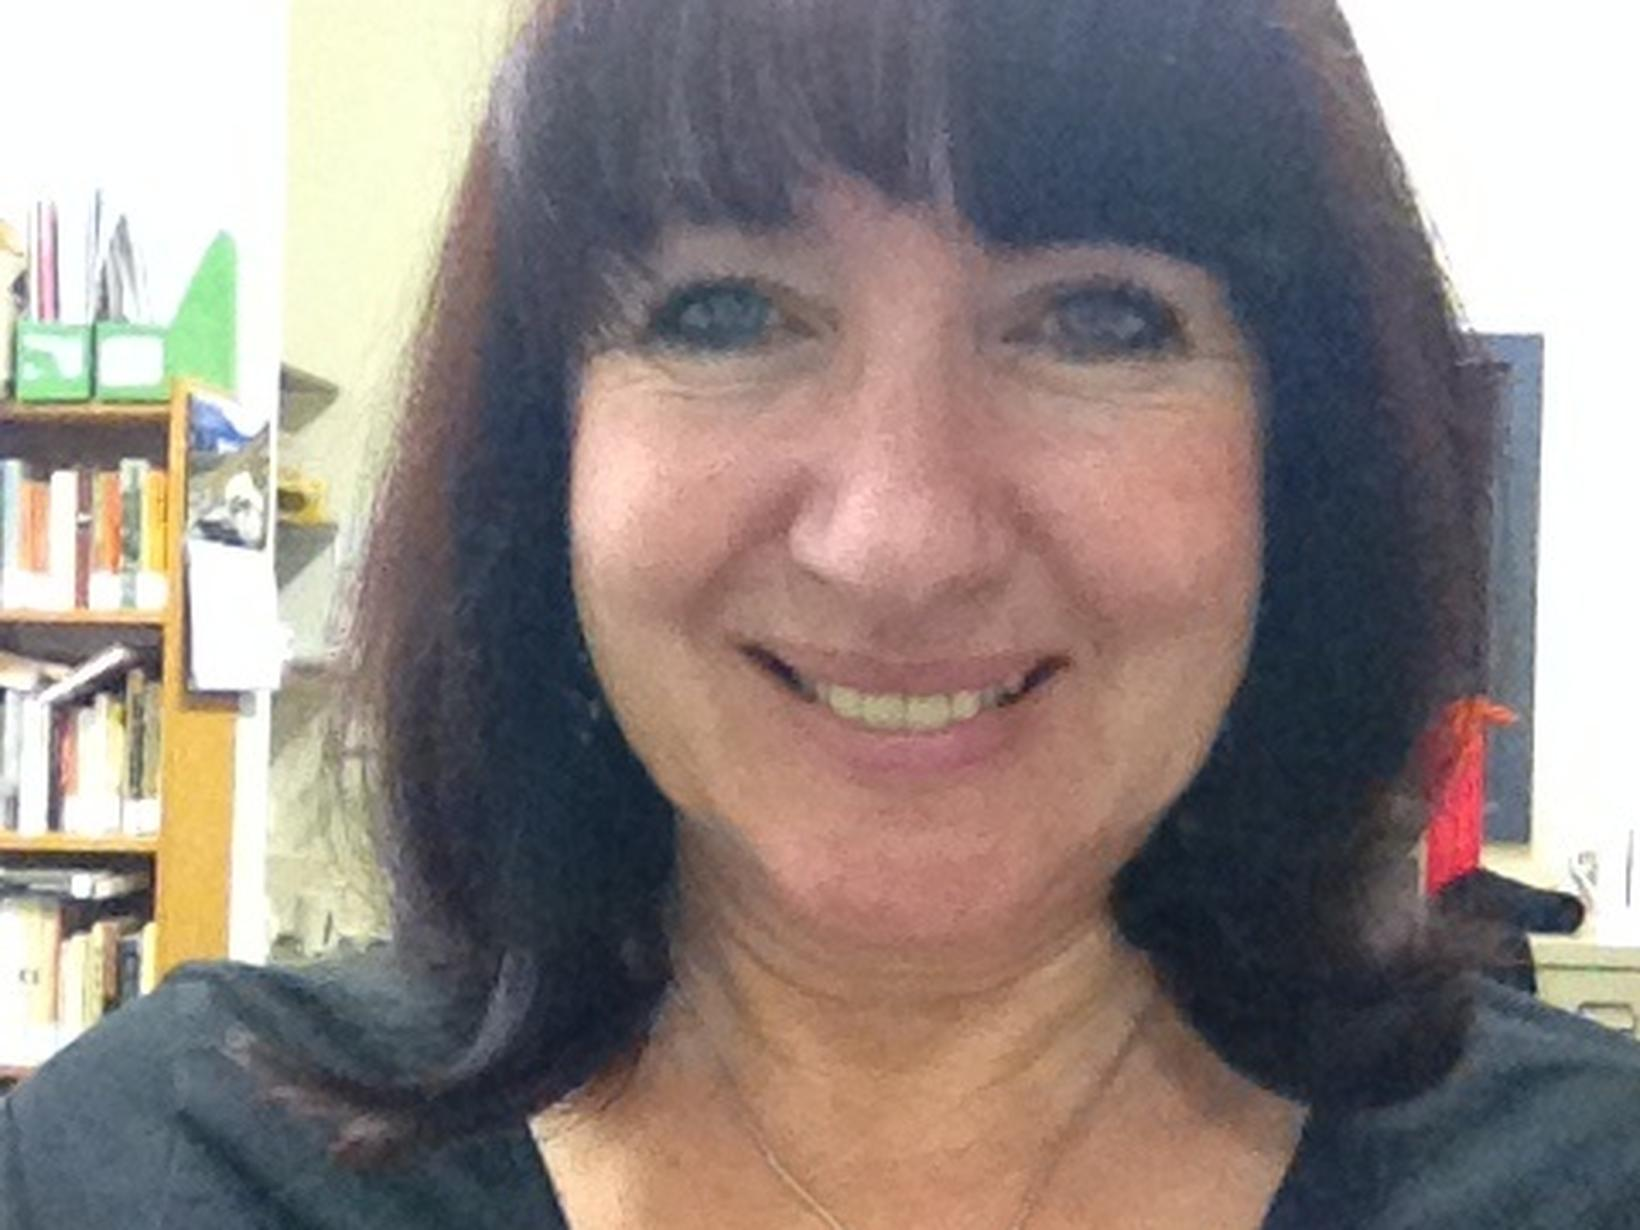 Jennifer from Melbourne, Victoria, Australia